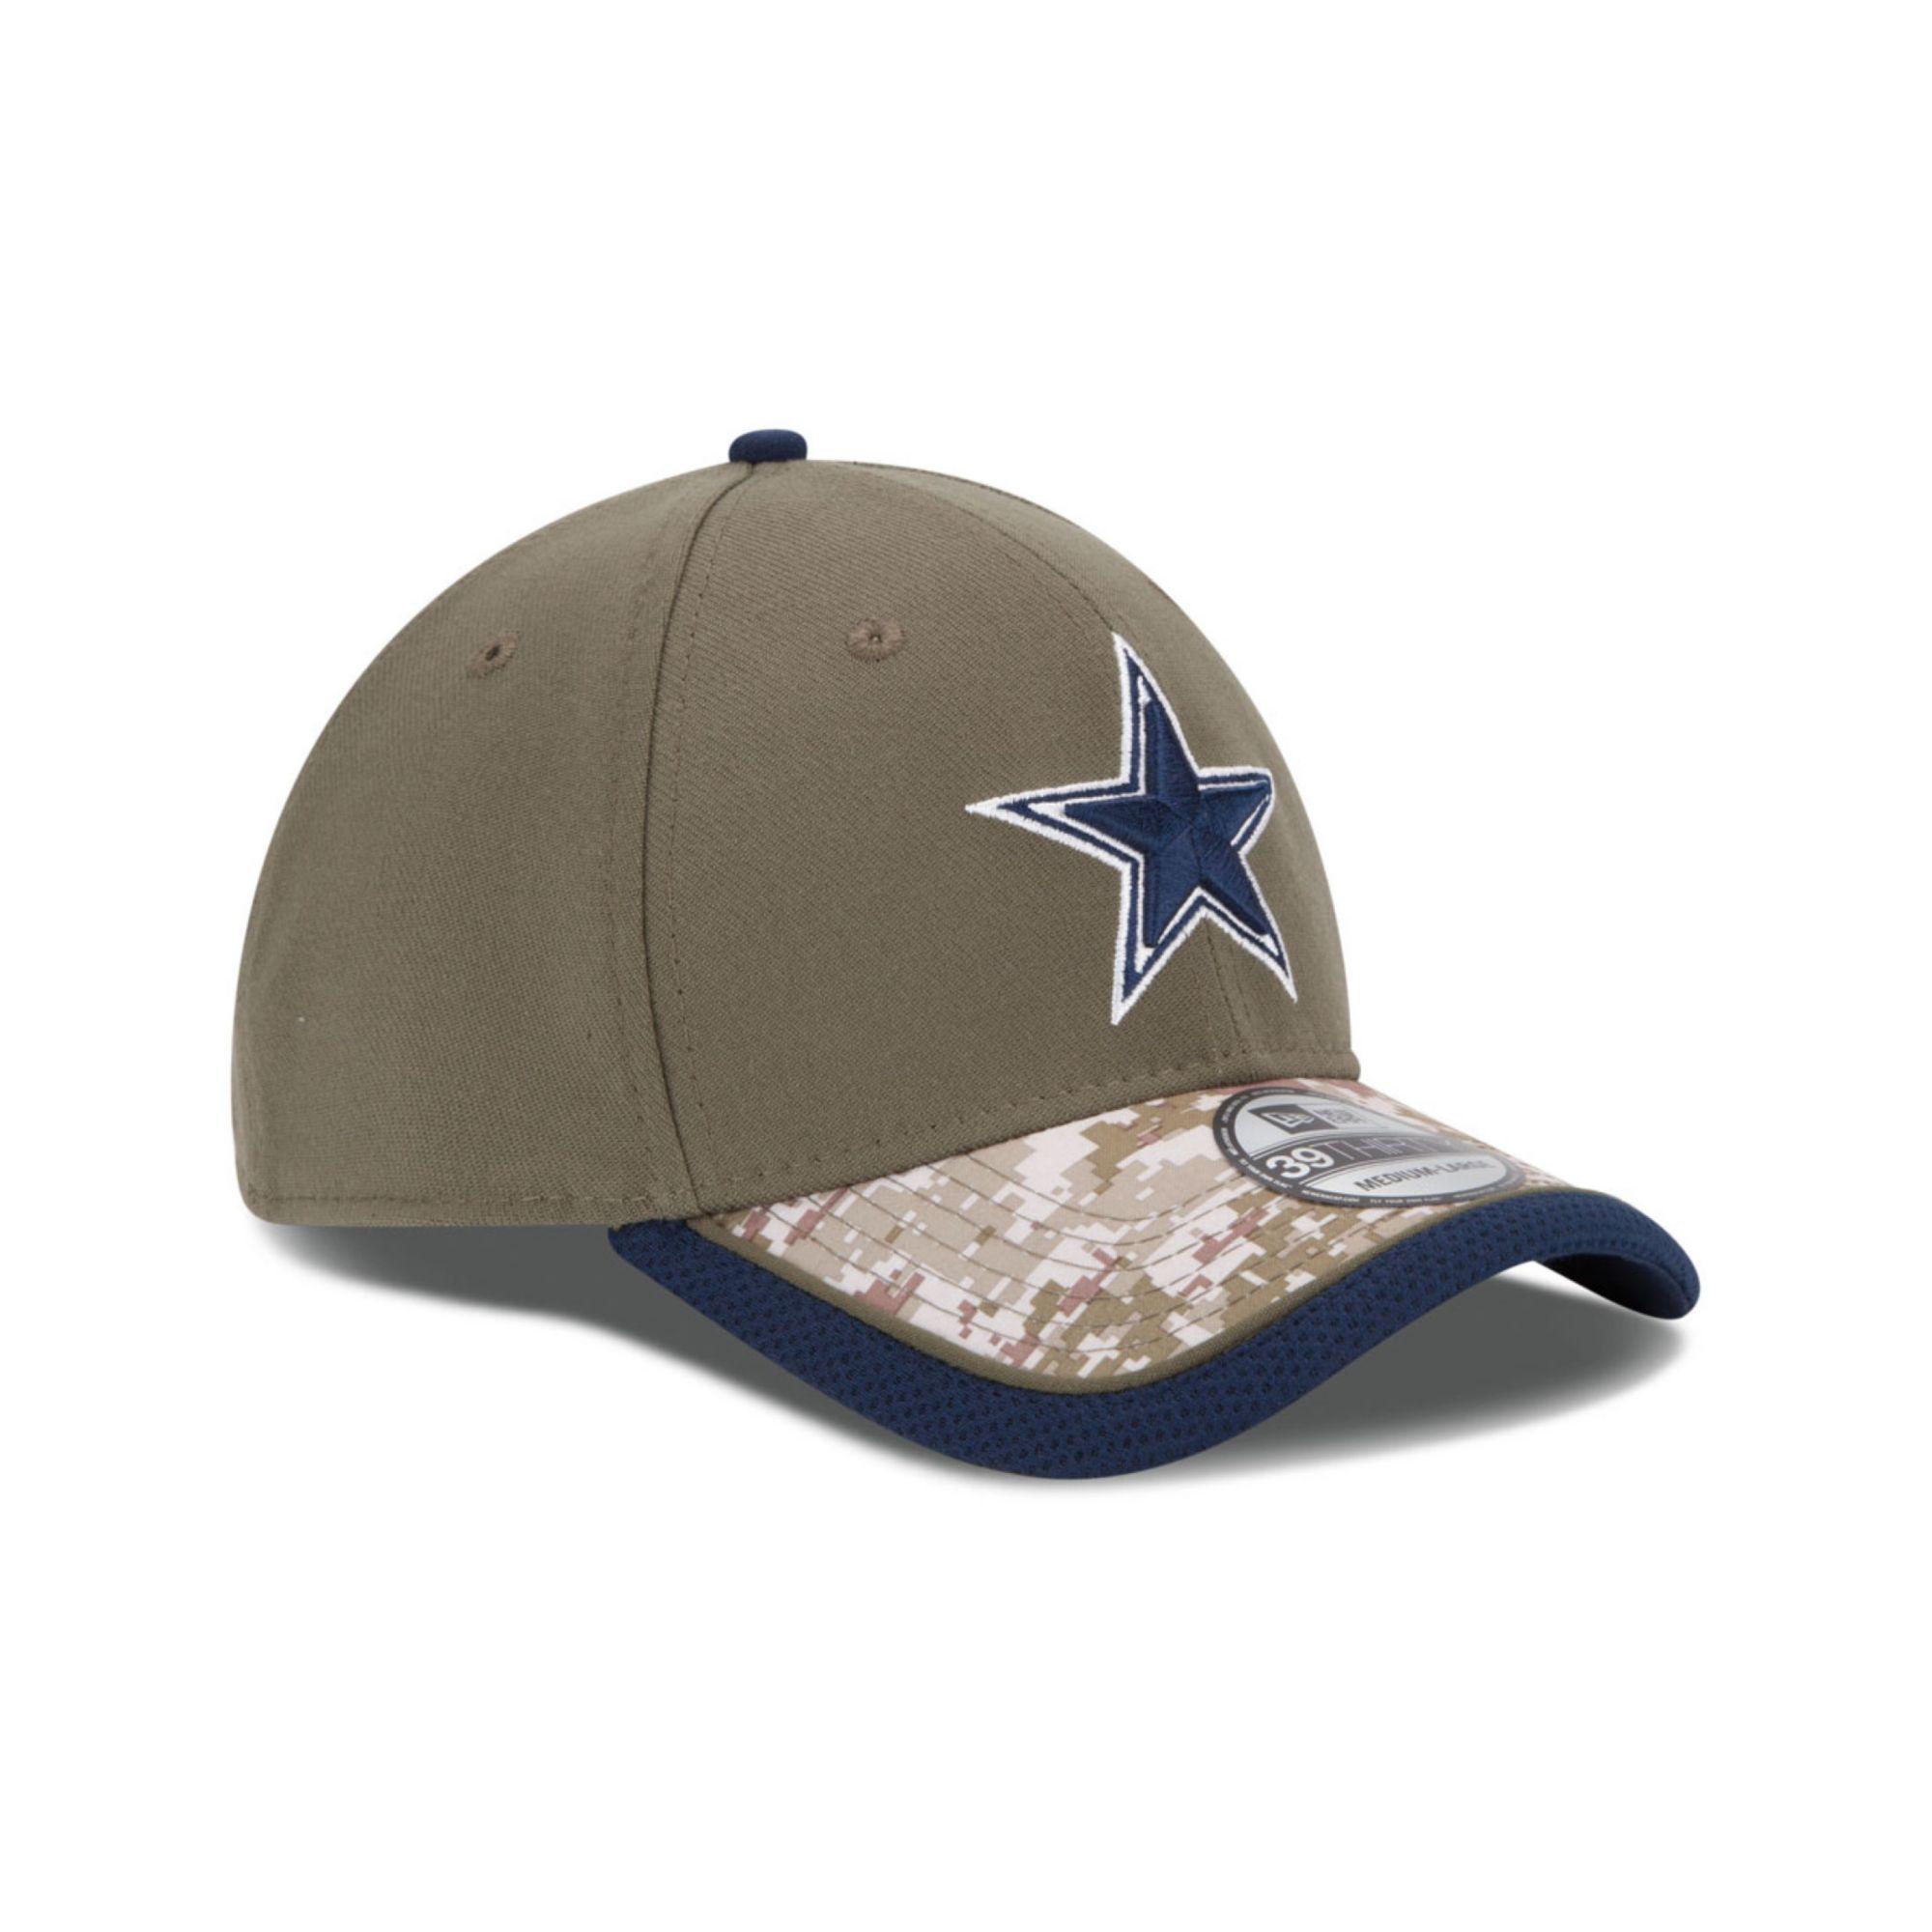 Lyst - KTZ Dallas Cowboys Salute To Service 39thirty Cap in Green ... df6743e8235